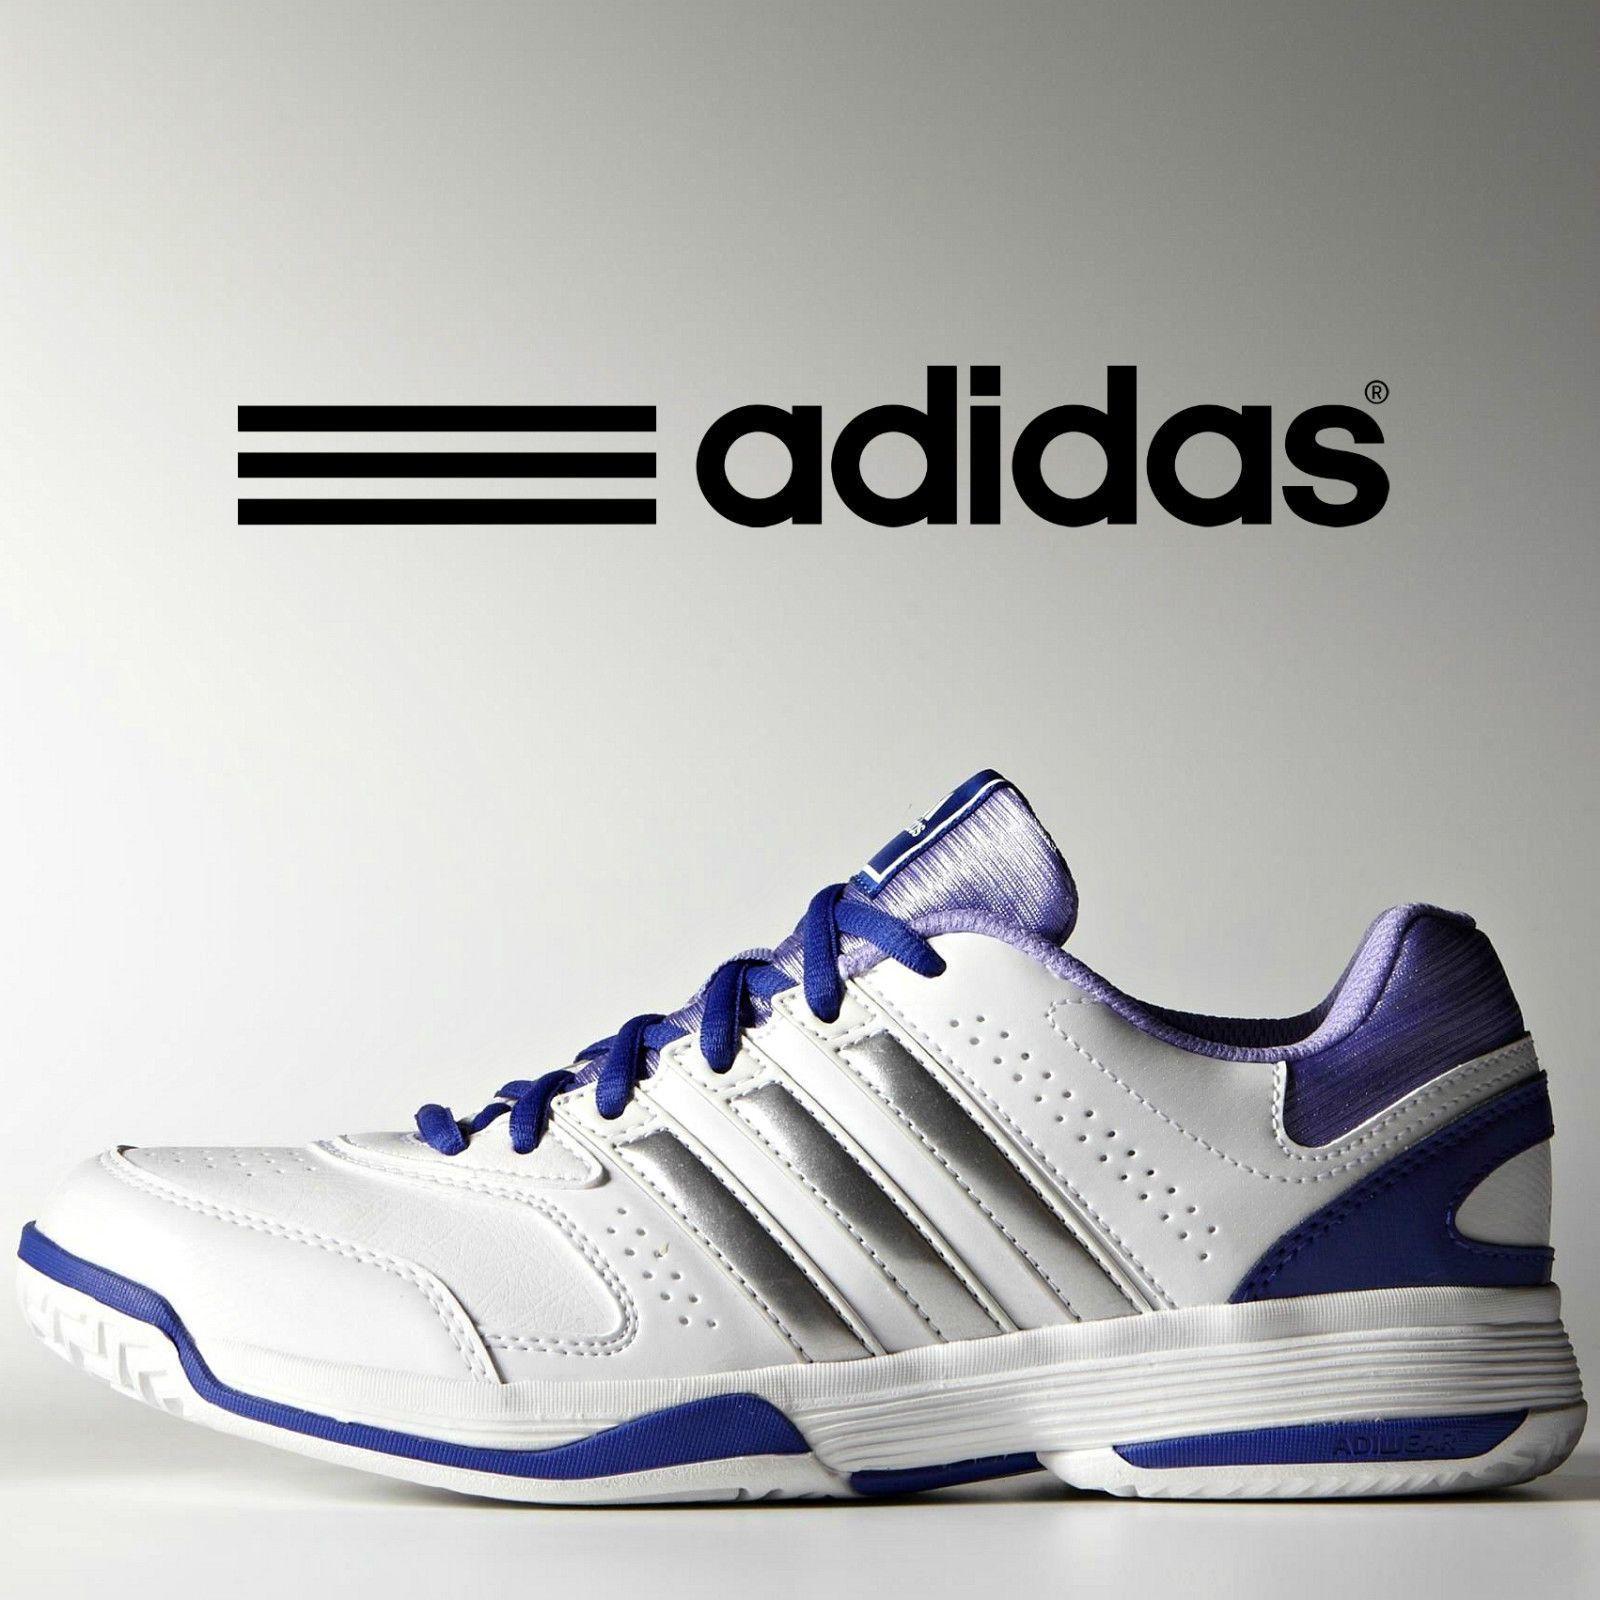 Pin by Zeppy.io on tennis | Adidas, Adidas women, Adidas